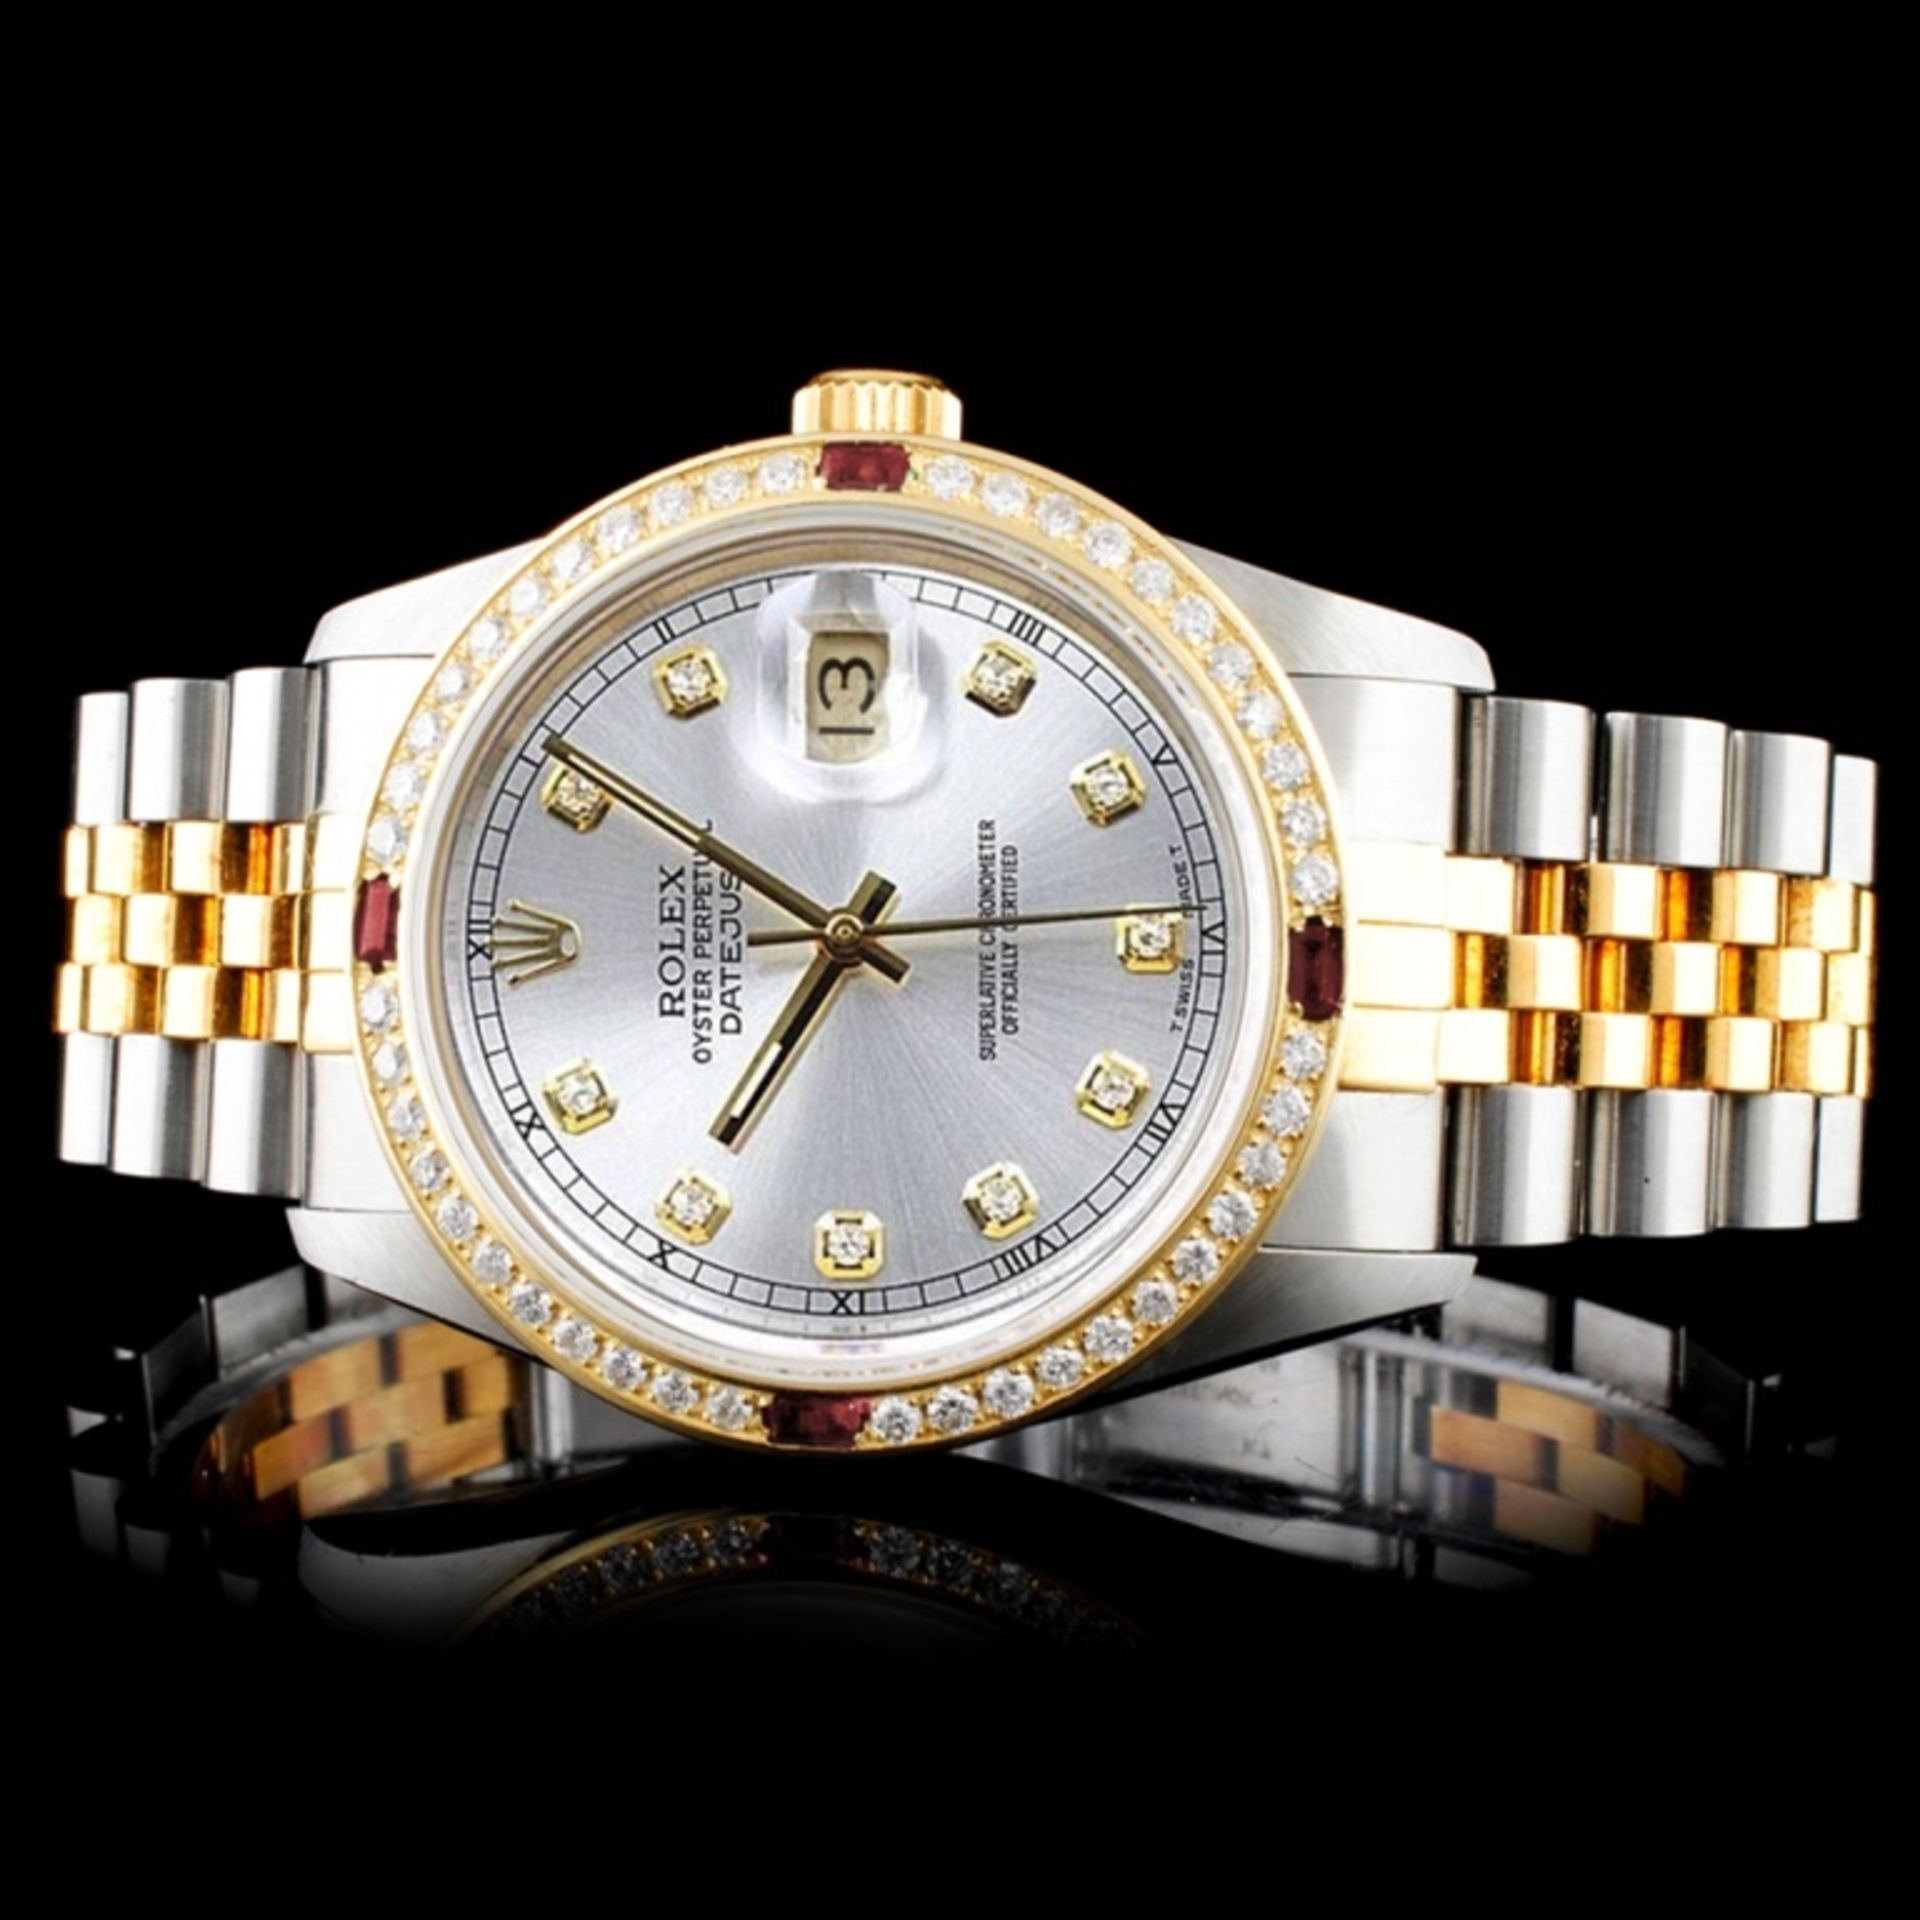 Rolex DateJust 18K/SS Diamond 36mm Watch - Image 2 of 6